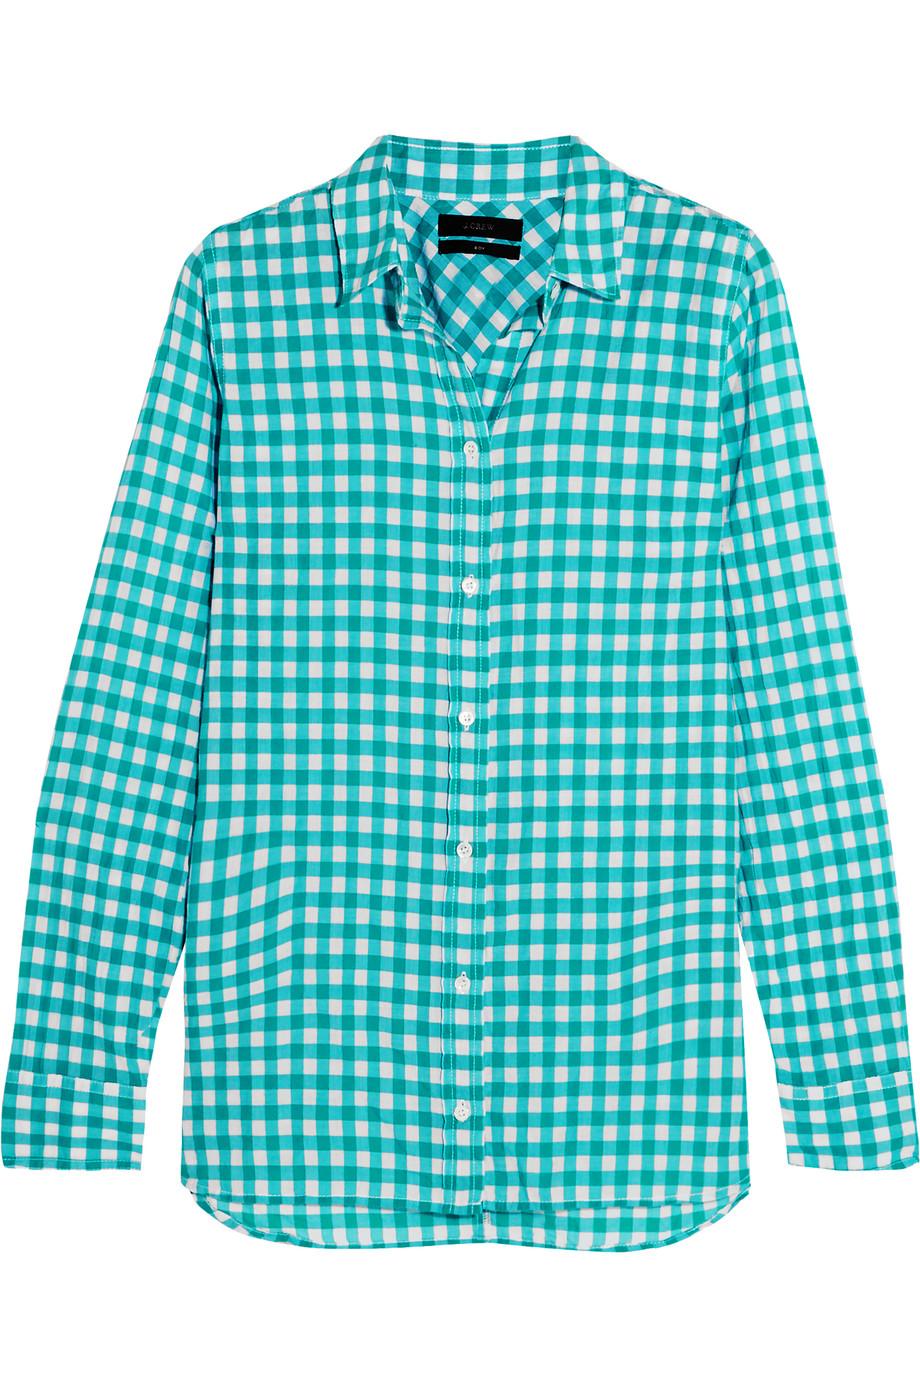 J.Crew Gingham Crinkled Cotton-Blend Poplin Shirt, Teal, Women's, Size: 6